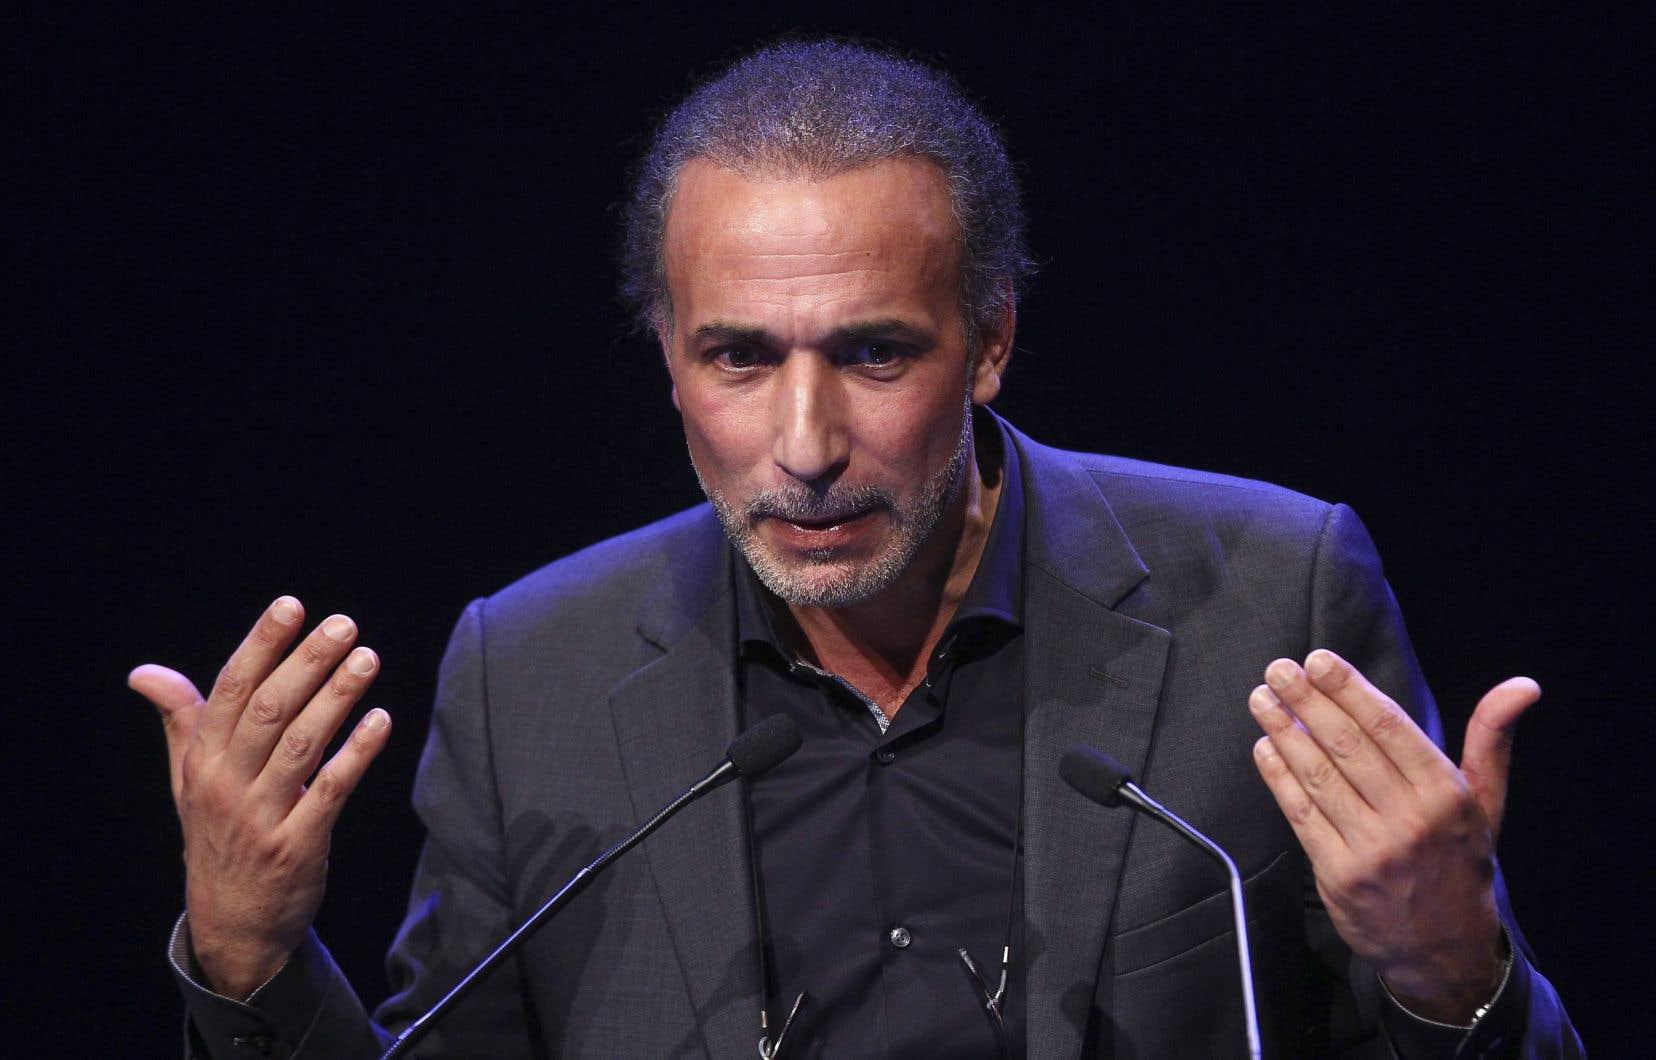 L'intellectuel Tariq Ramadan, lors d'un rassemblement à Lille en novembre 2017